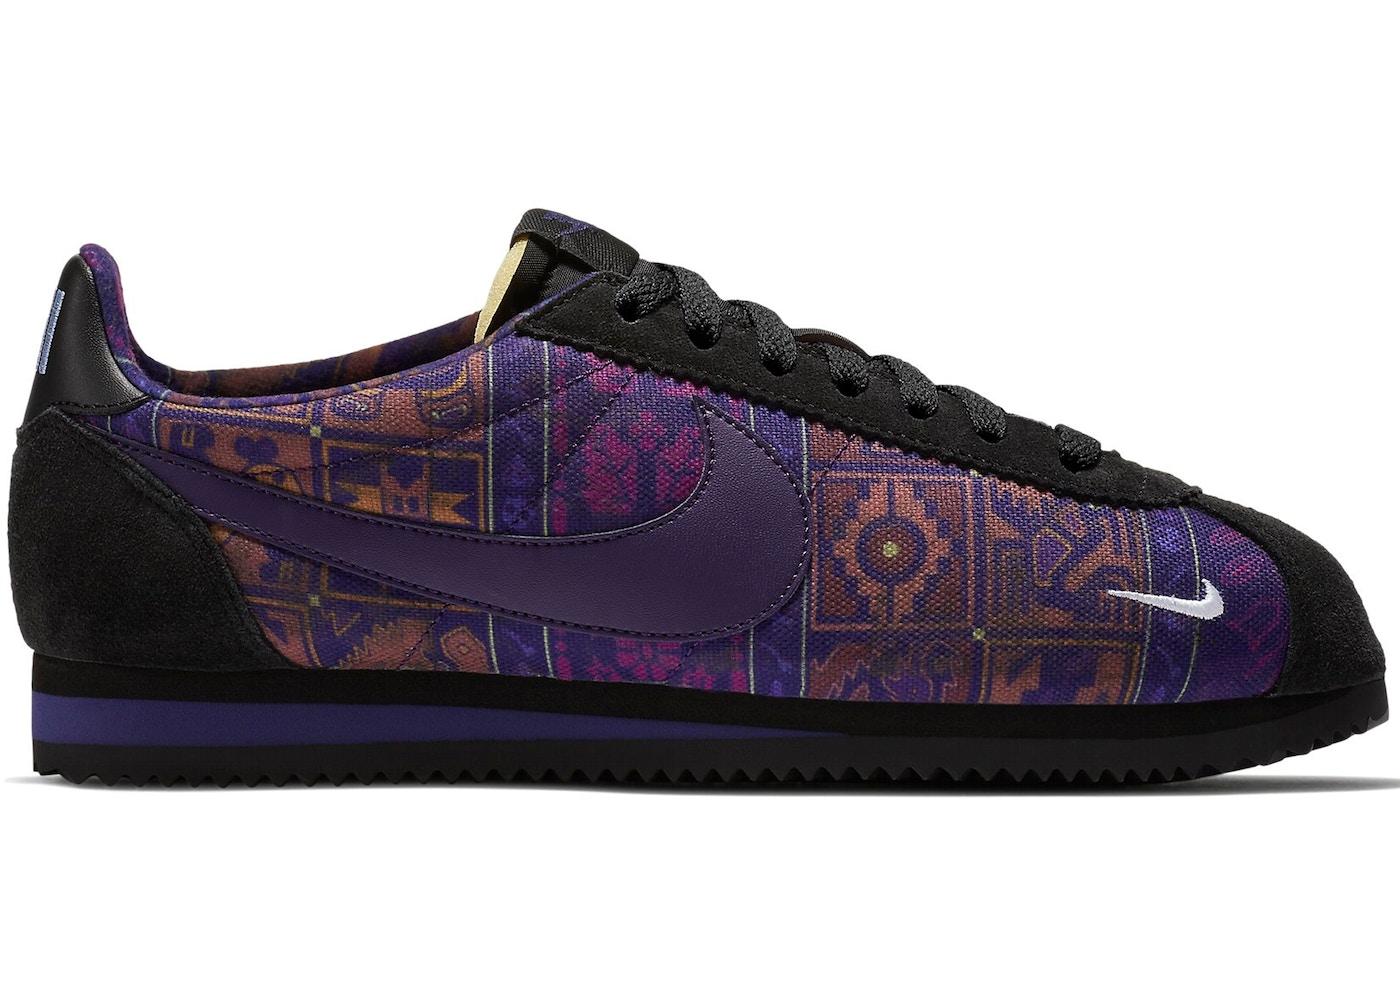 Nike Classic Cortez Nylon Los Primeros - AH7741-500 7bce2ec3f34